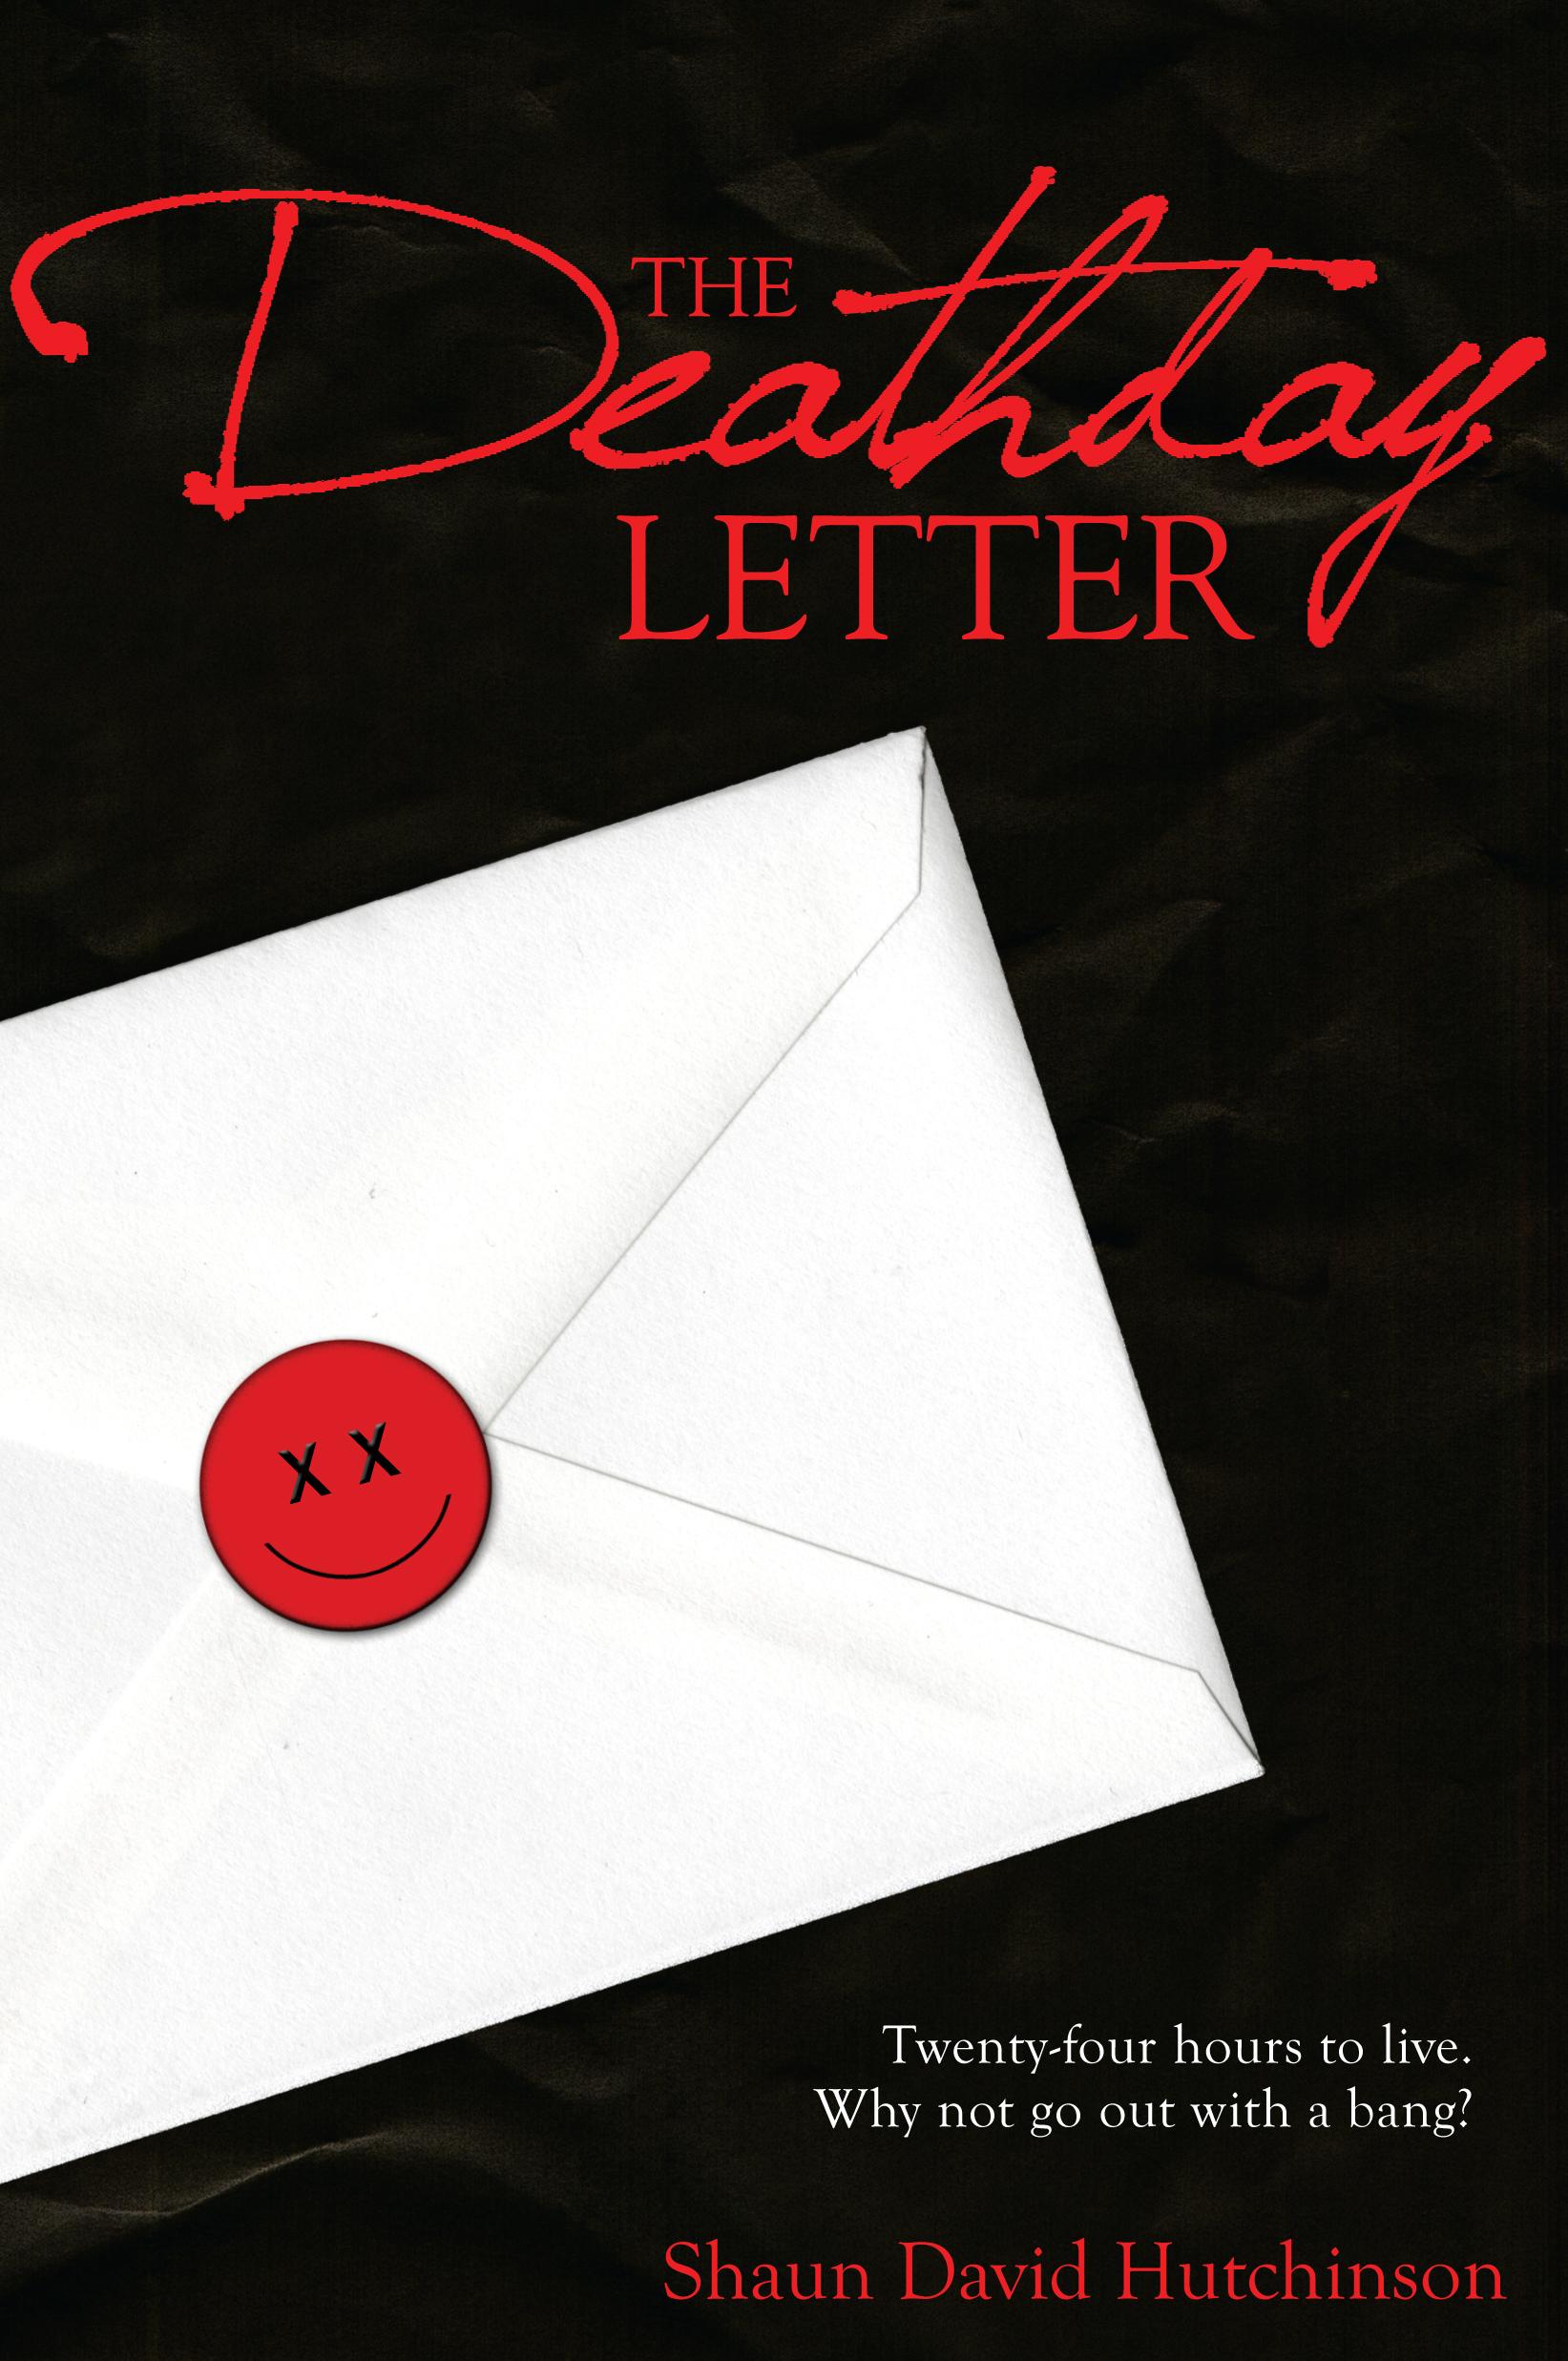 shaun-david-hutchinson-deathday-letter.jpg